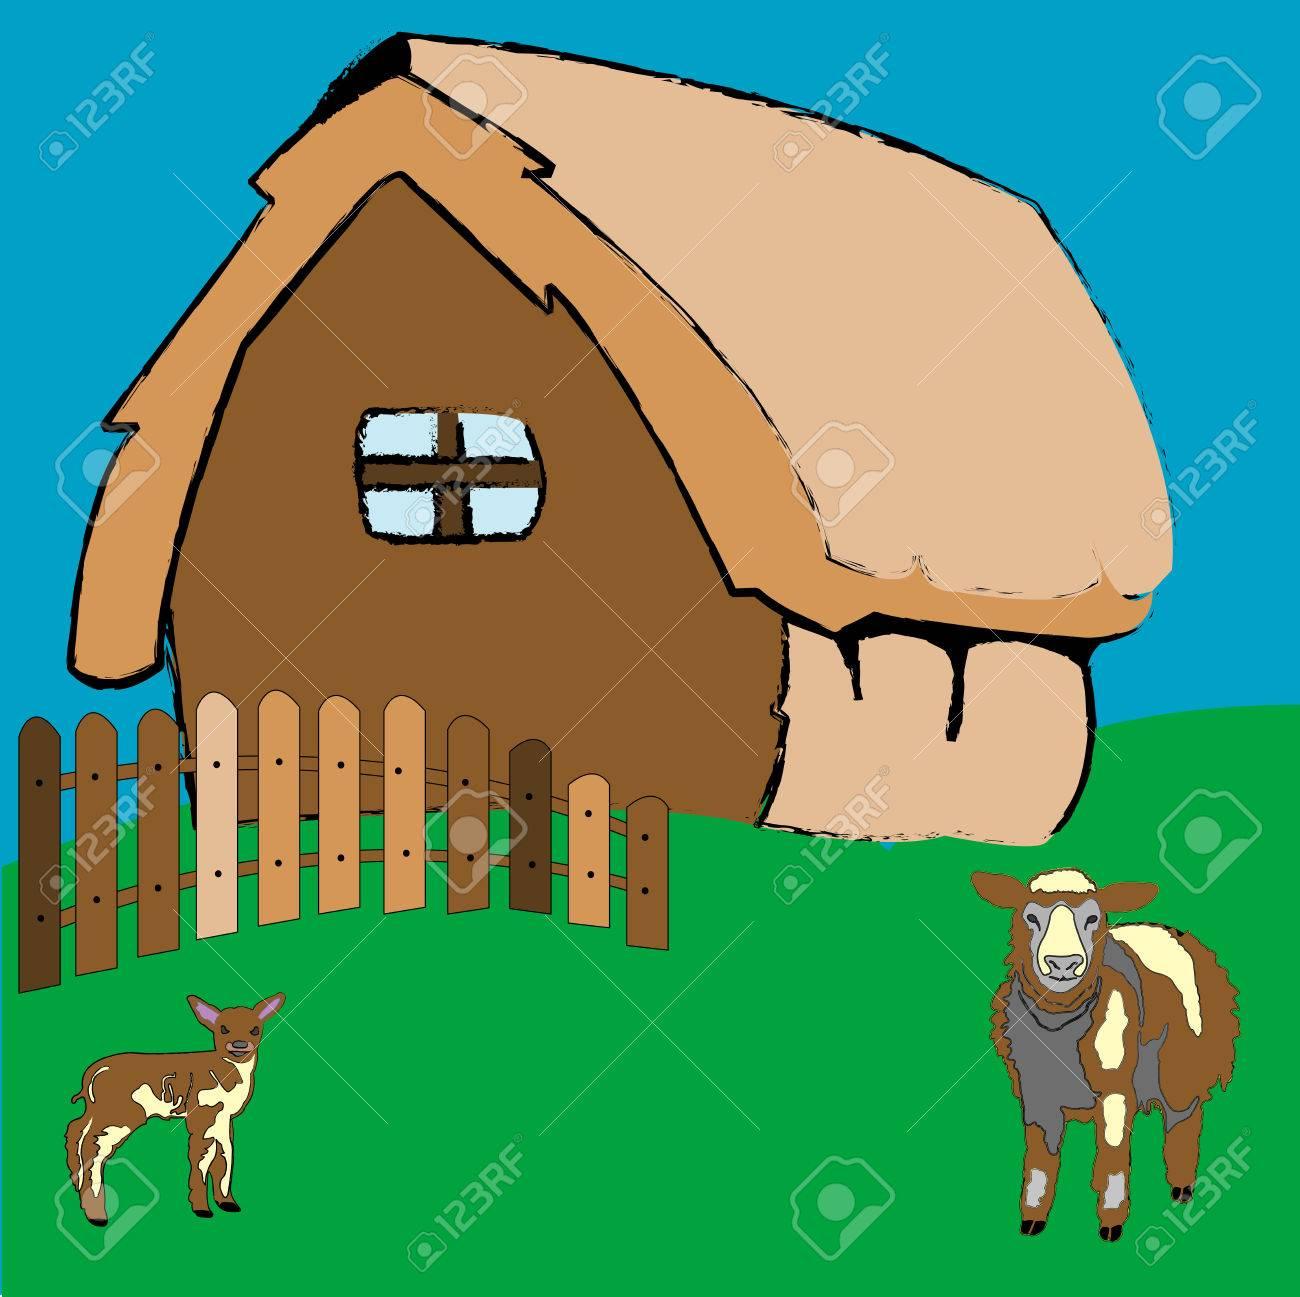 33   Großartig animal farm house for Animal Farm House Drawing  565ane